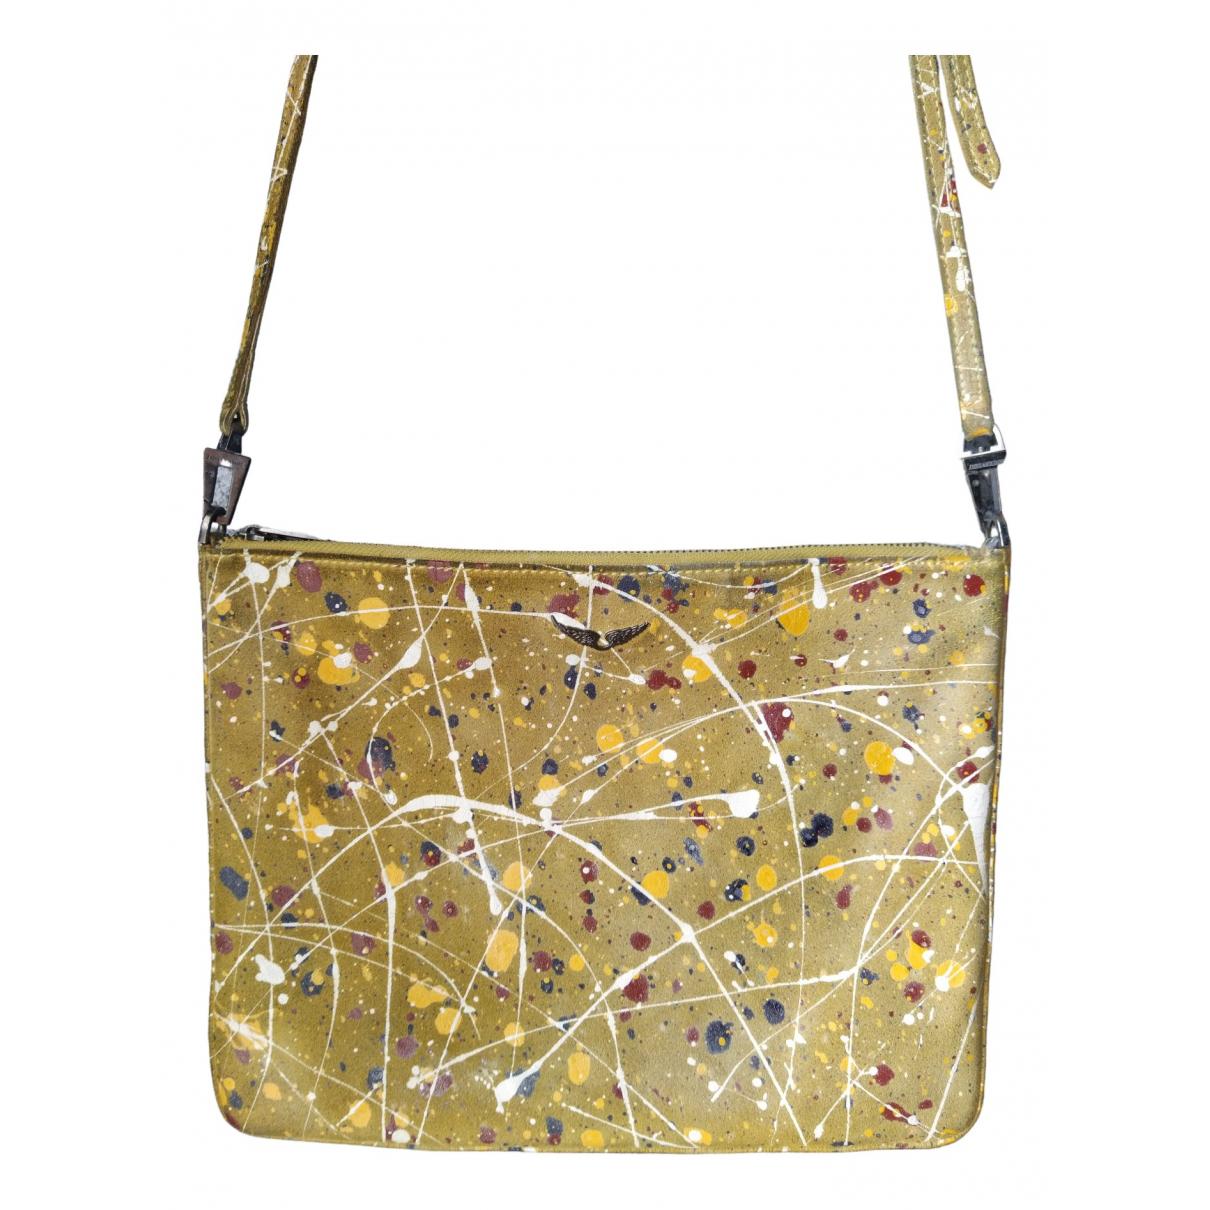 Zadig & Voltaire \N Yellow Leather handbag for Women \N